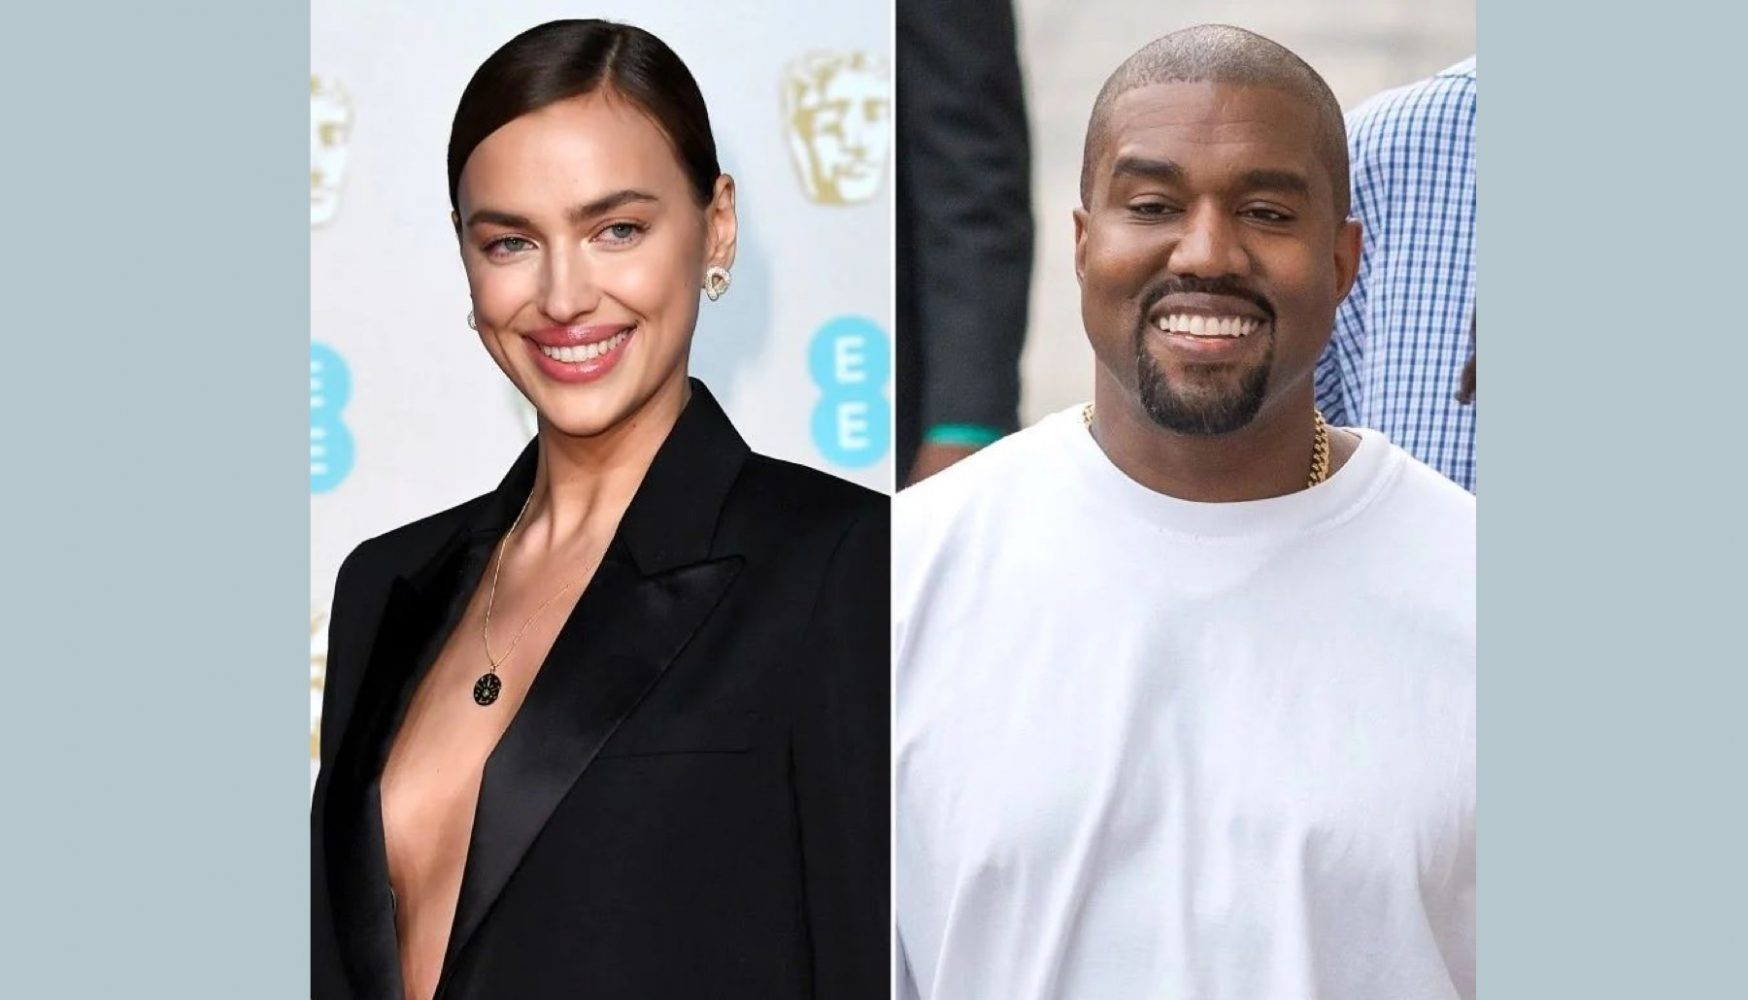 Irina Shayk y Kanye West